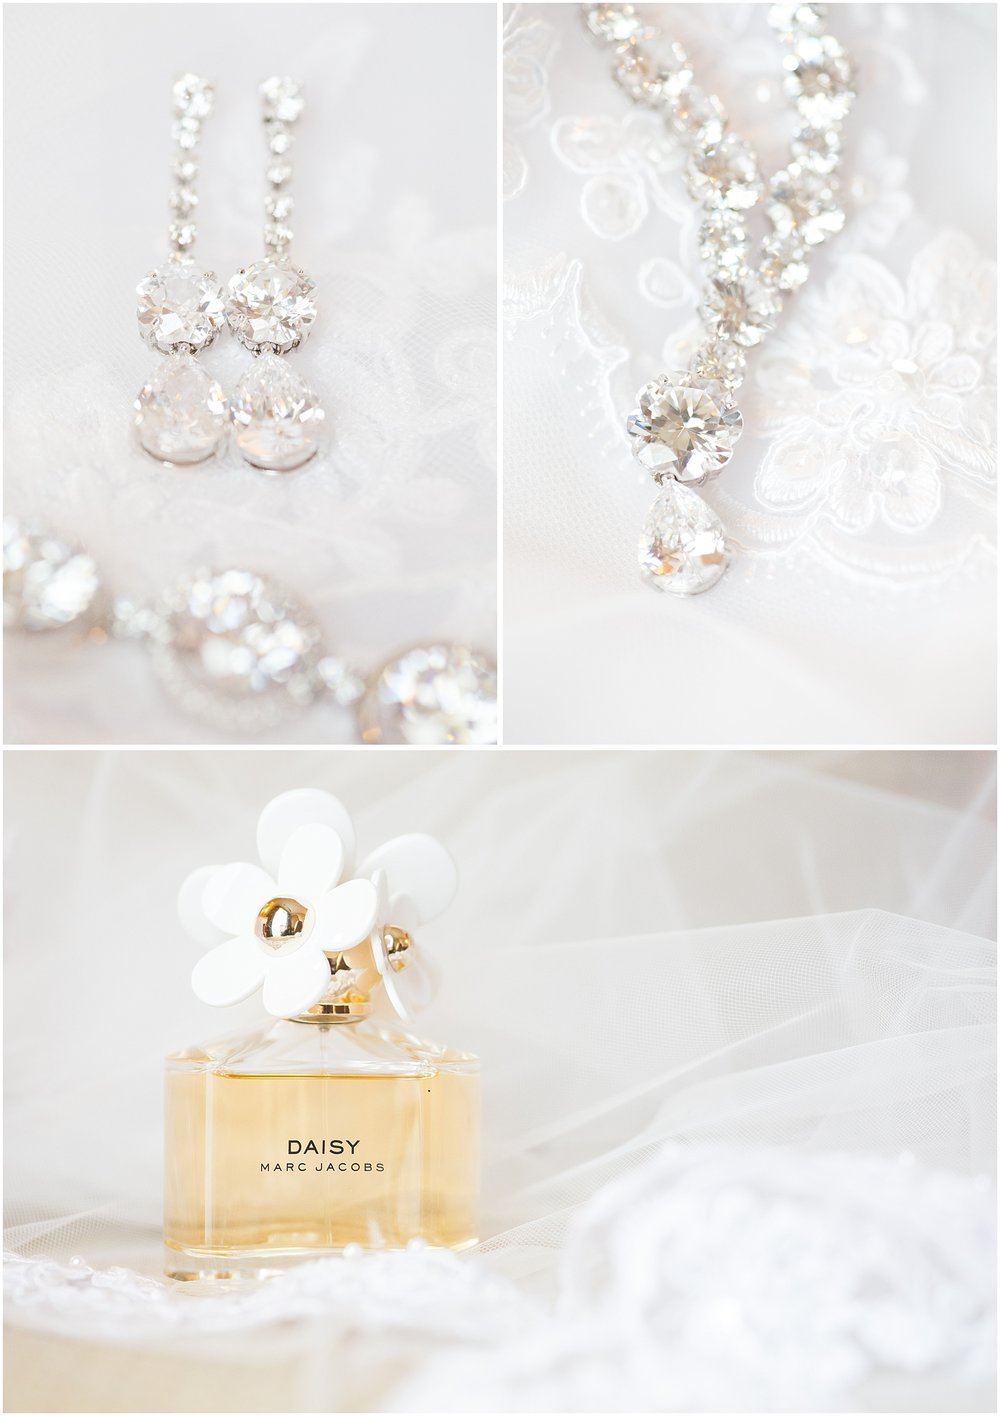 styled bridal jewelry details inspiration perfume Calgary wedding photography